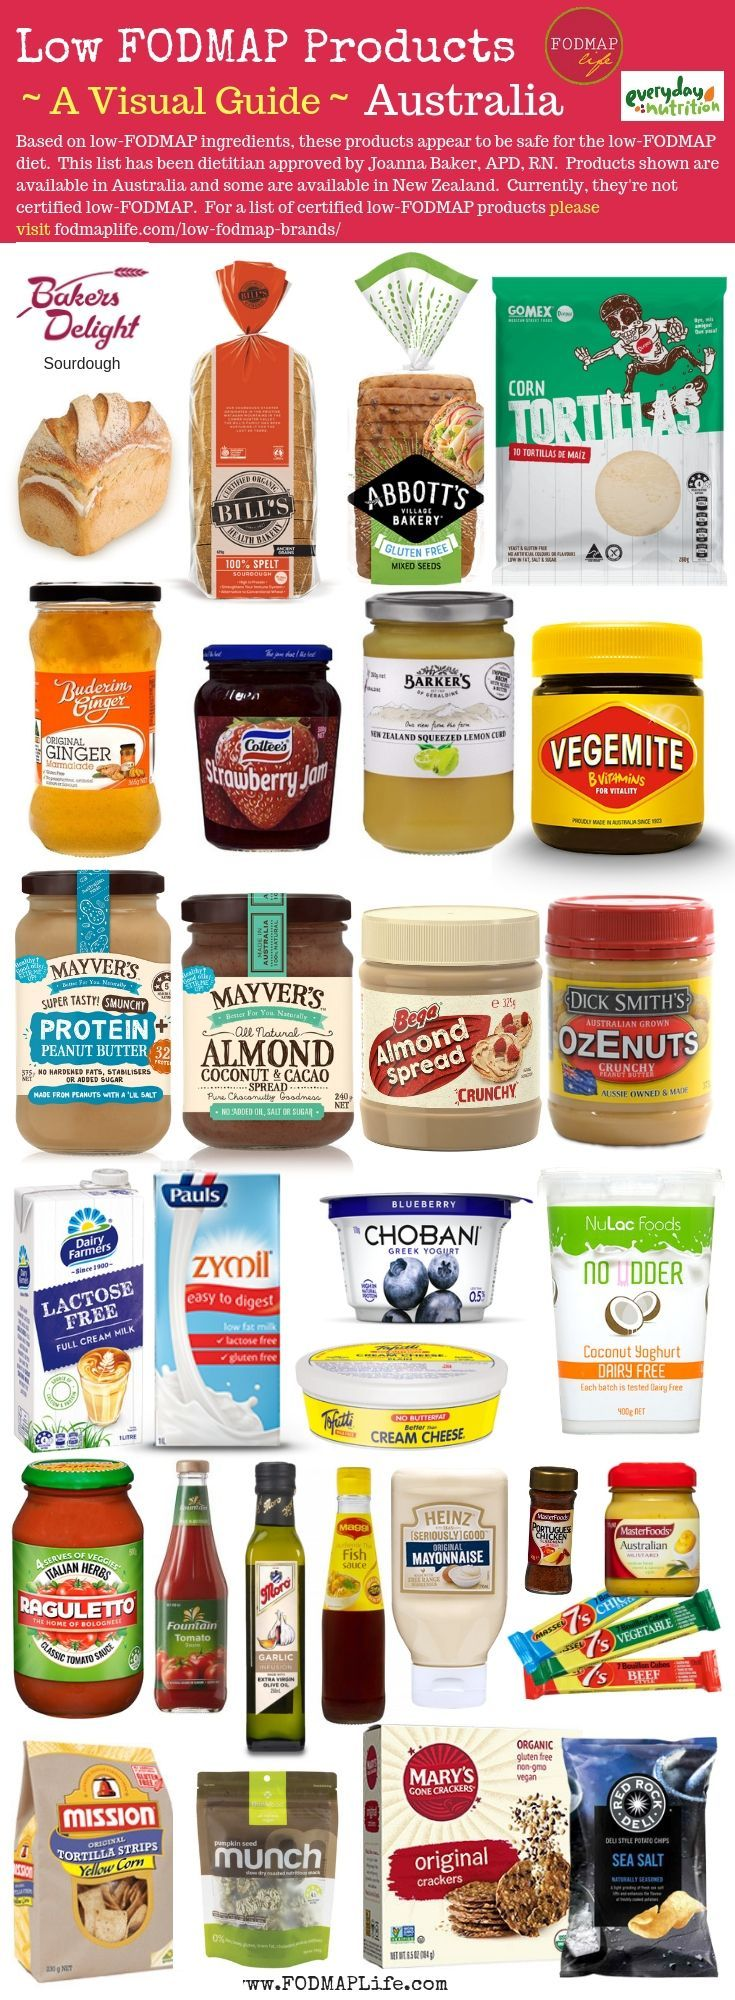 LowFODMAP Products A Visual Guide Low fodmap diet